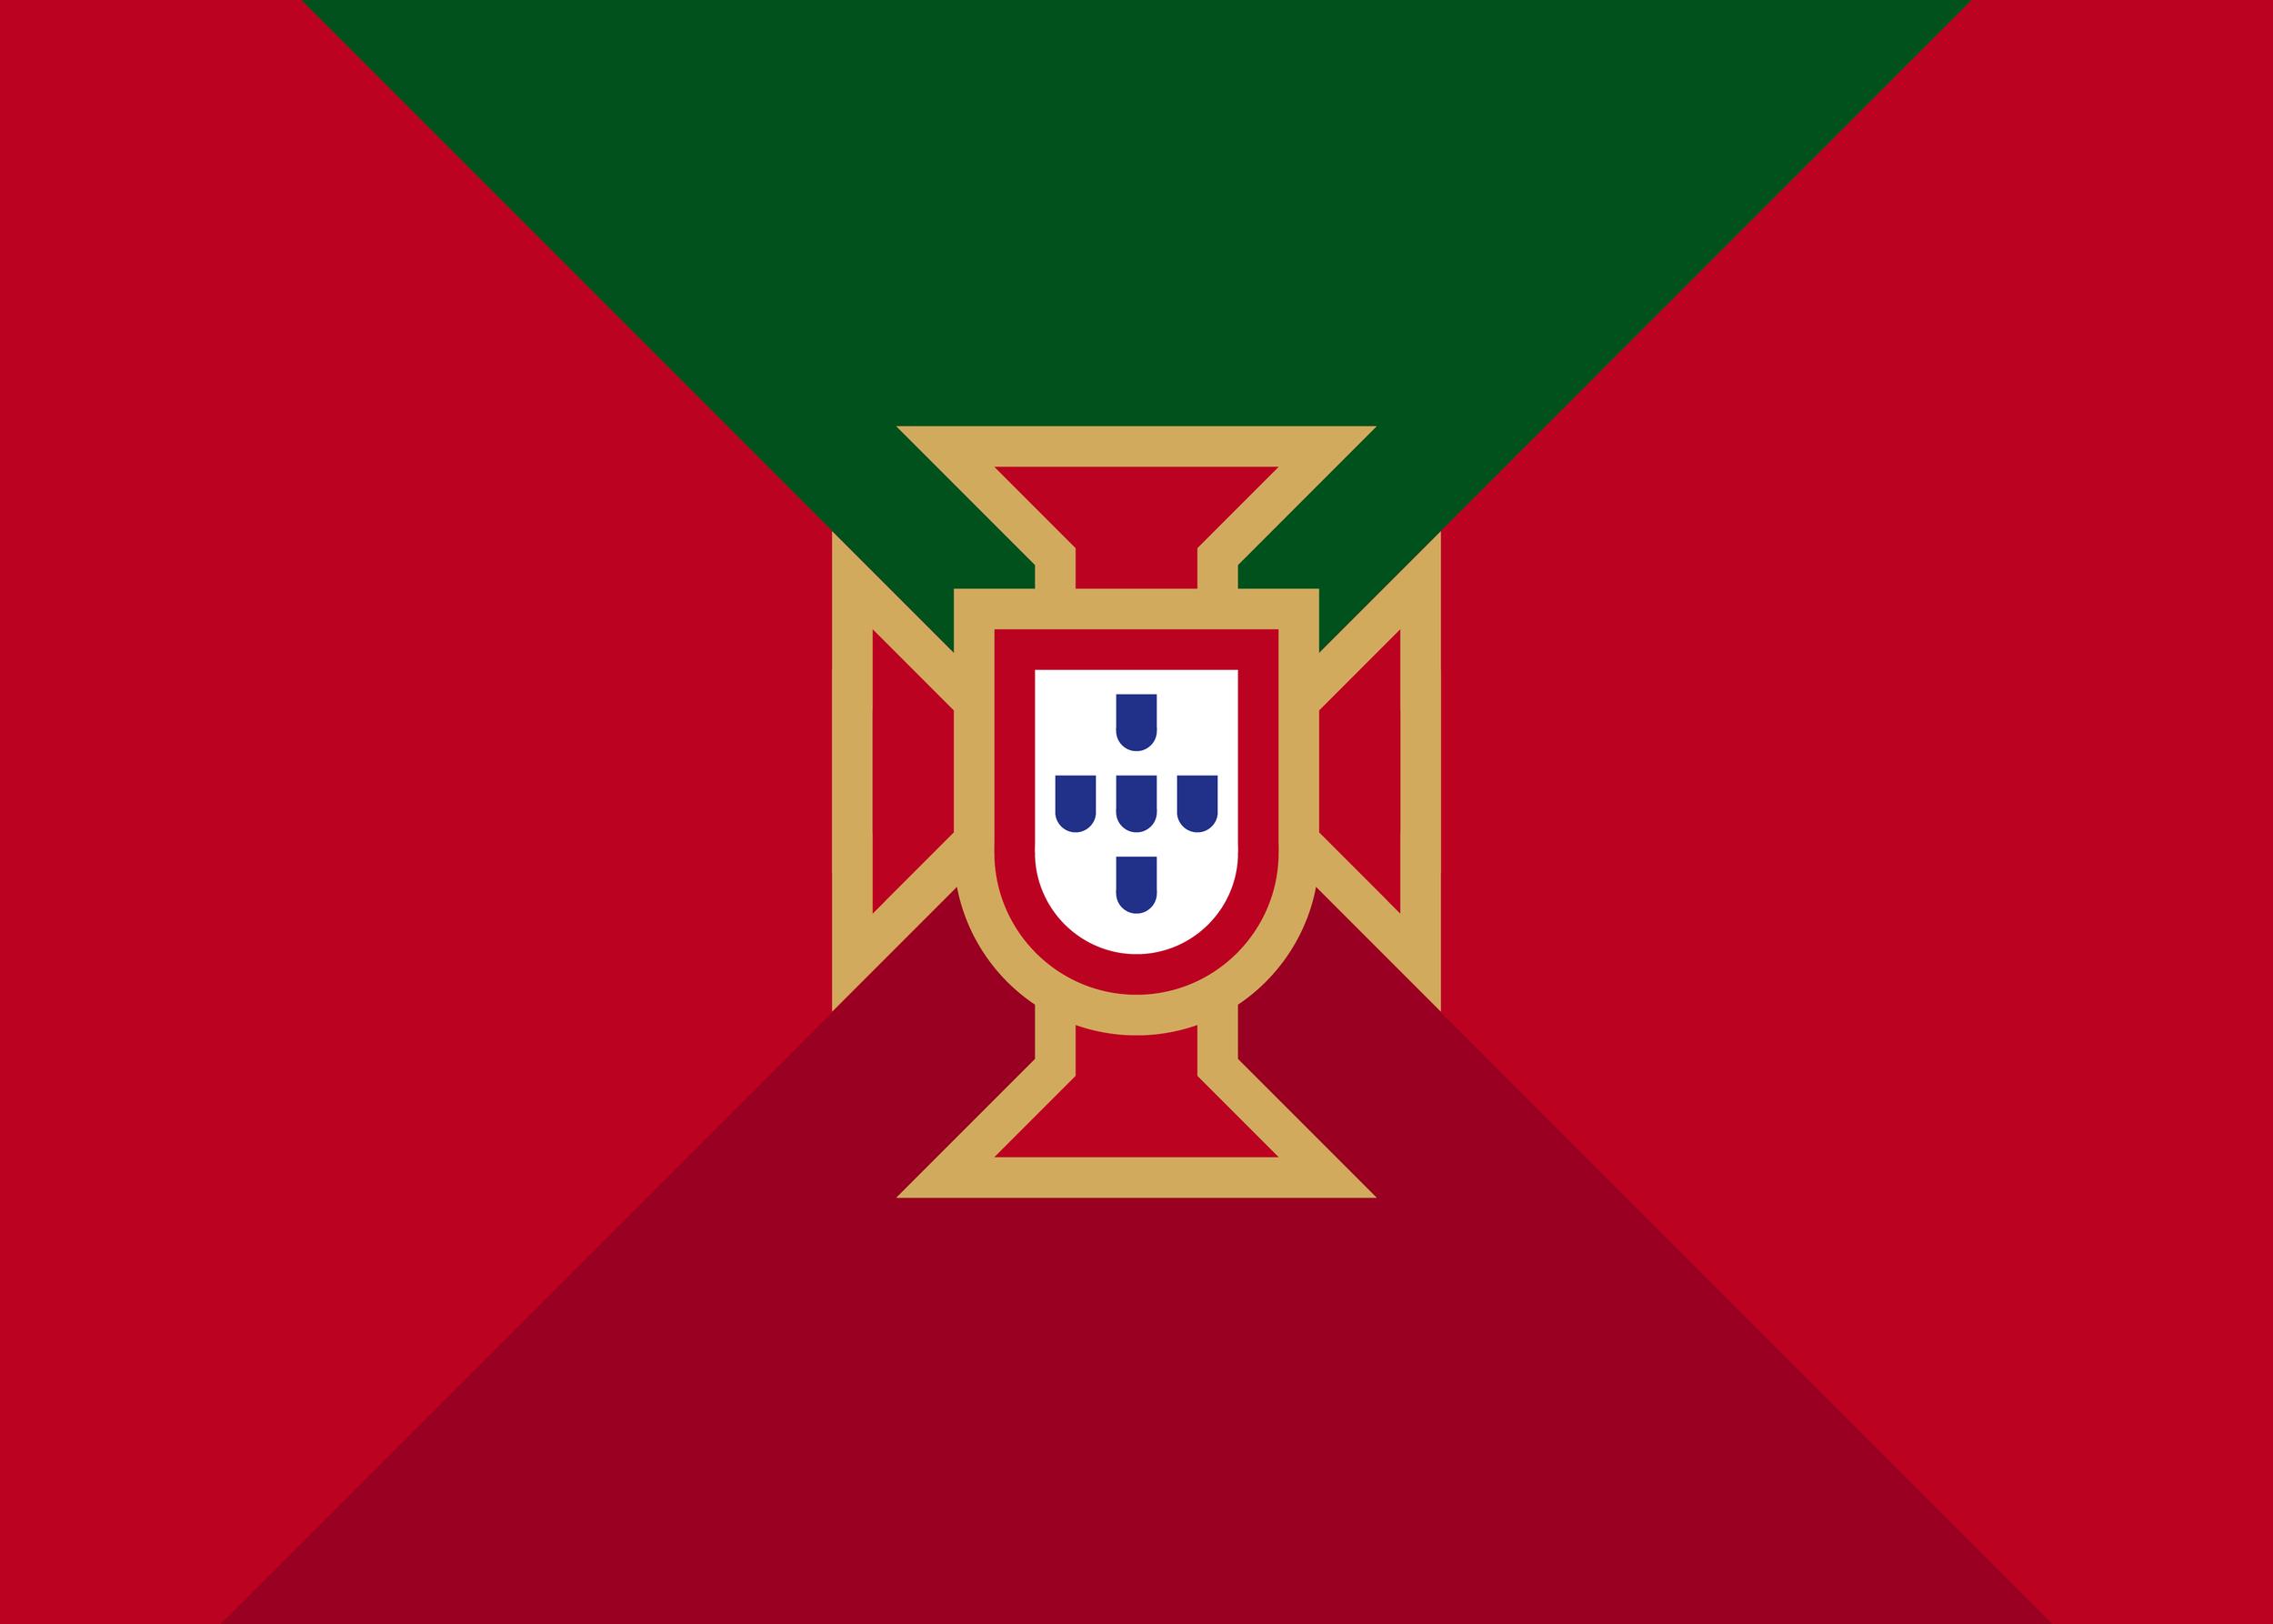 Portugal-Geometric-World-Cup-Football-Badge-01-Logo-Design-Freelance-Kent.png